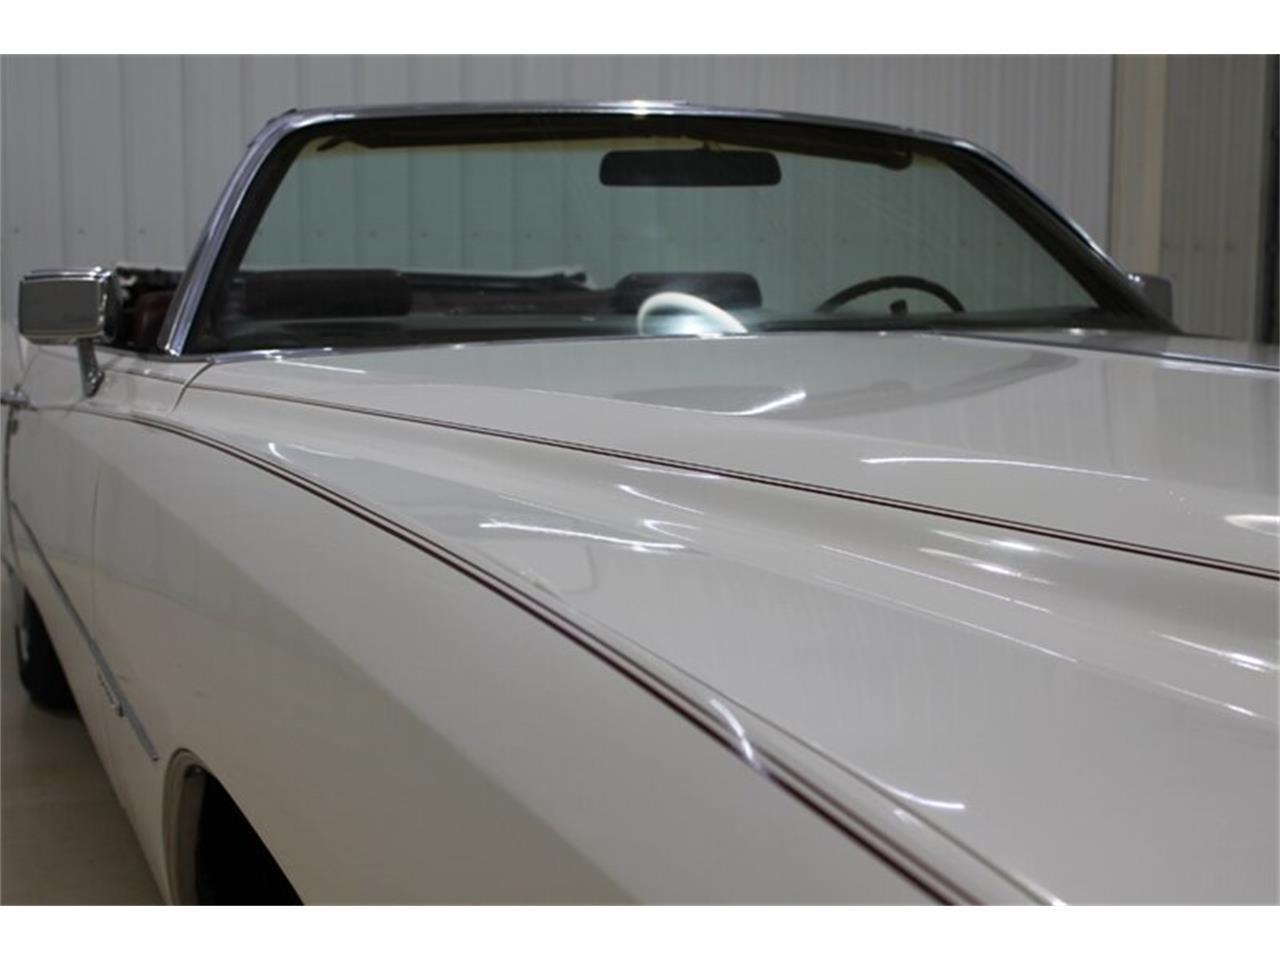 1972 Cadillac Eldorado (CC-1222895) for sale in Fort Wayne, Indiana